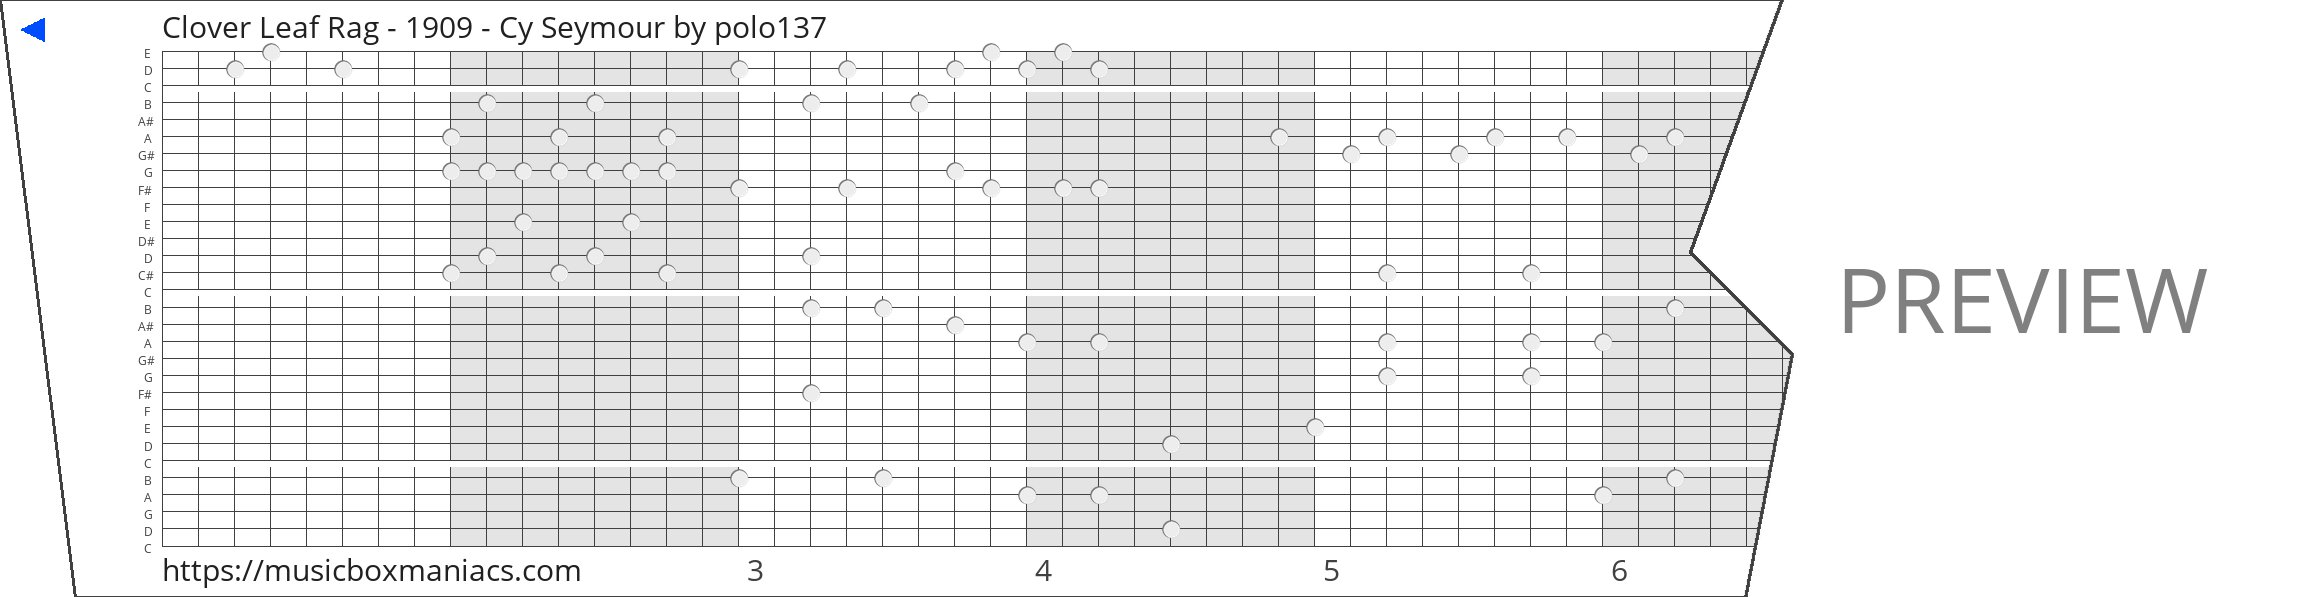 Clover Leaf Rag - 1909 - Cy Seymour 30 note music box paper strip